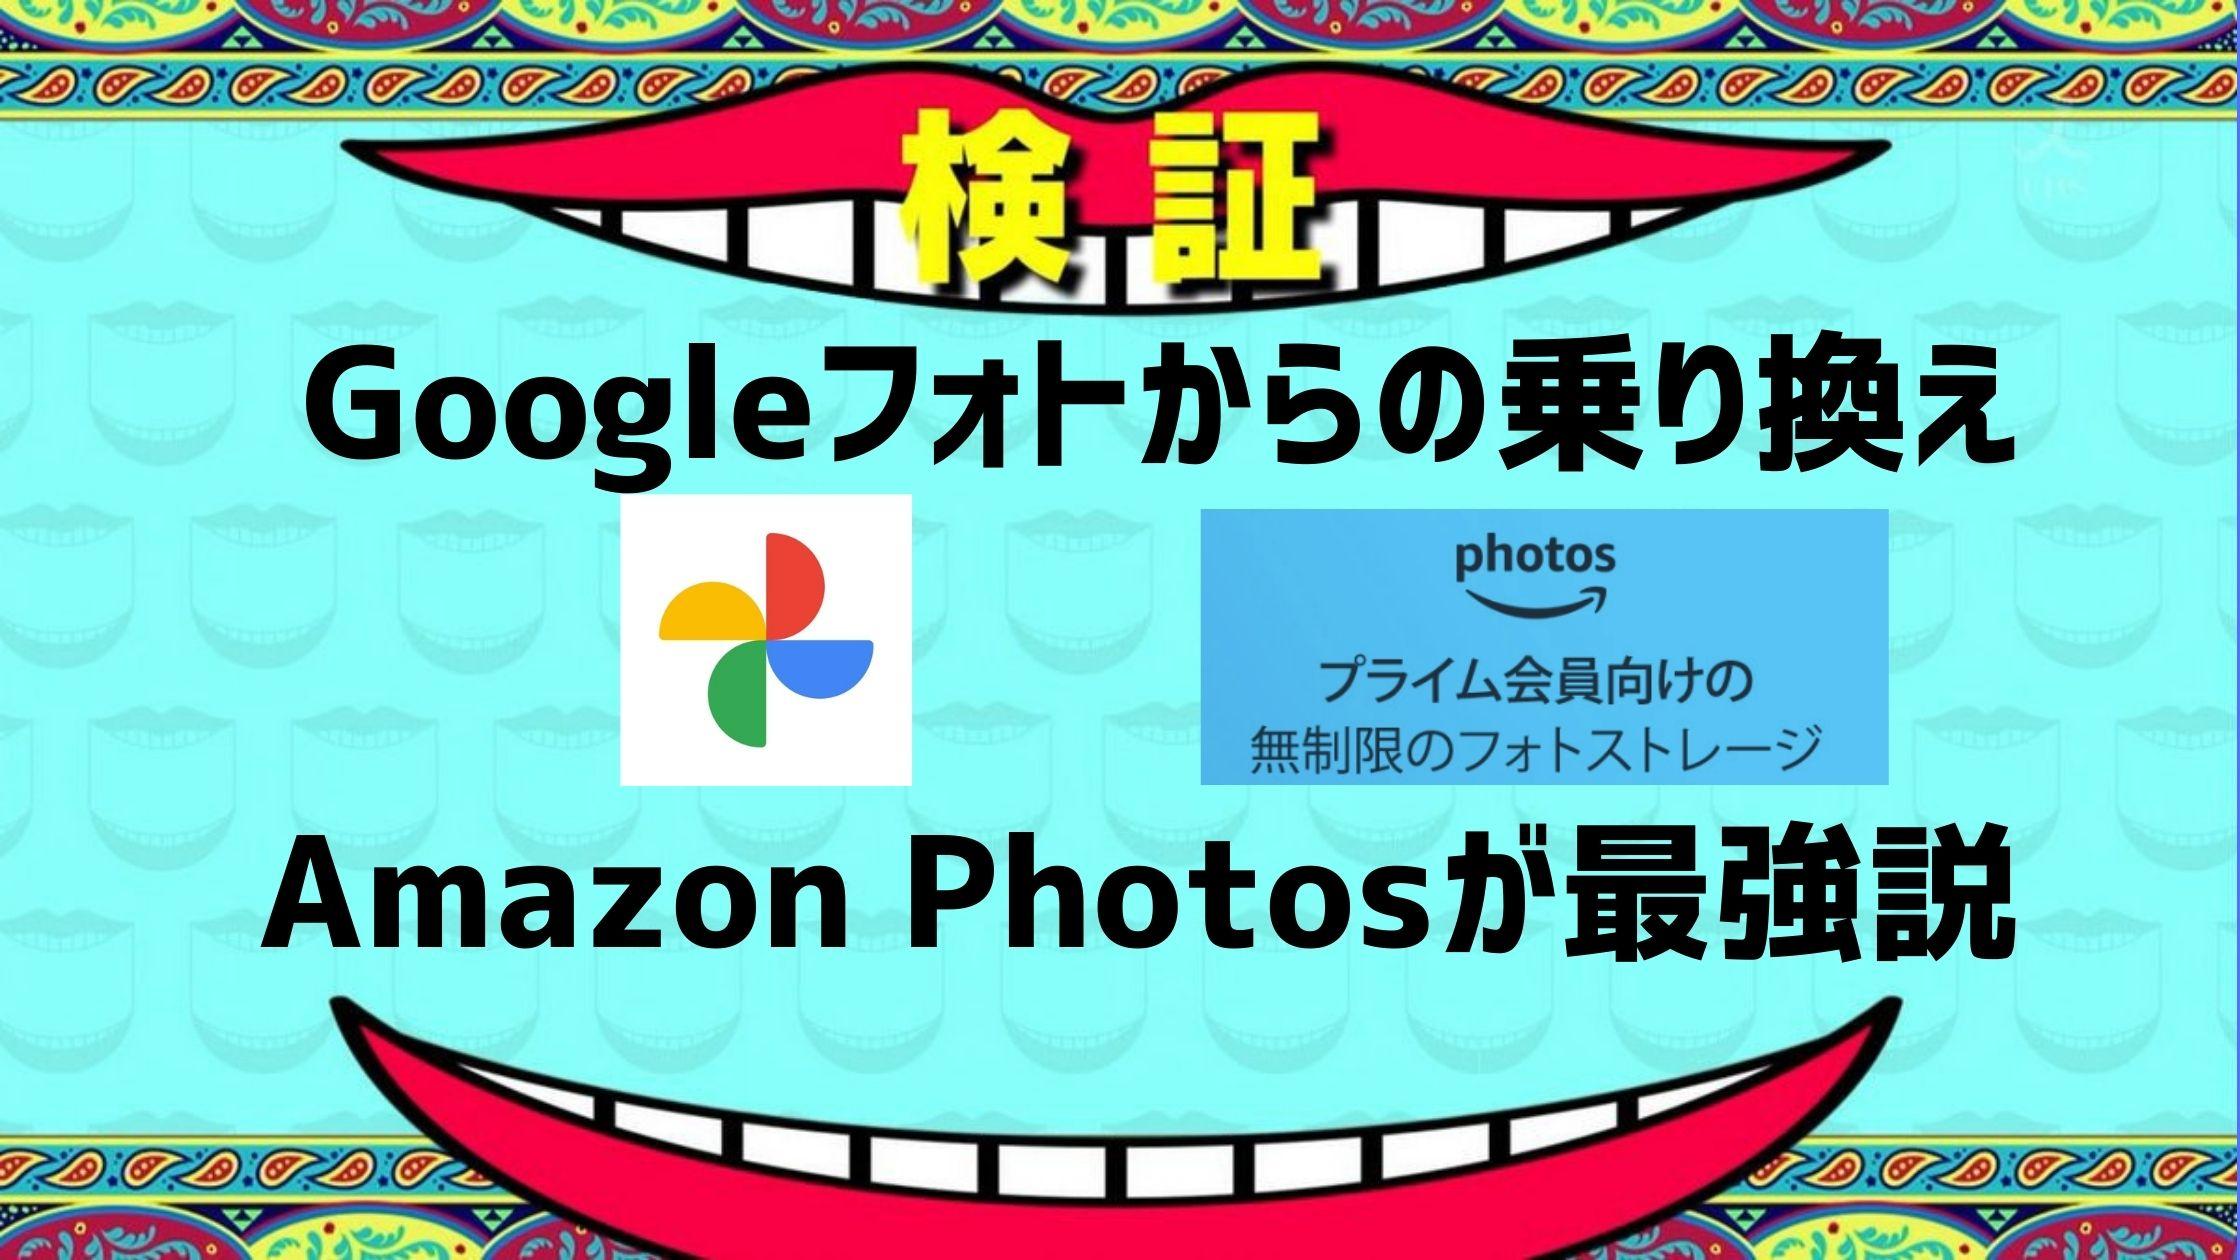 Amazon,Prime,クラウド,ドライブ,Google,無料,特典,photos